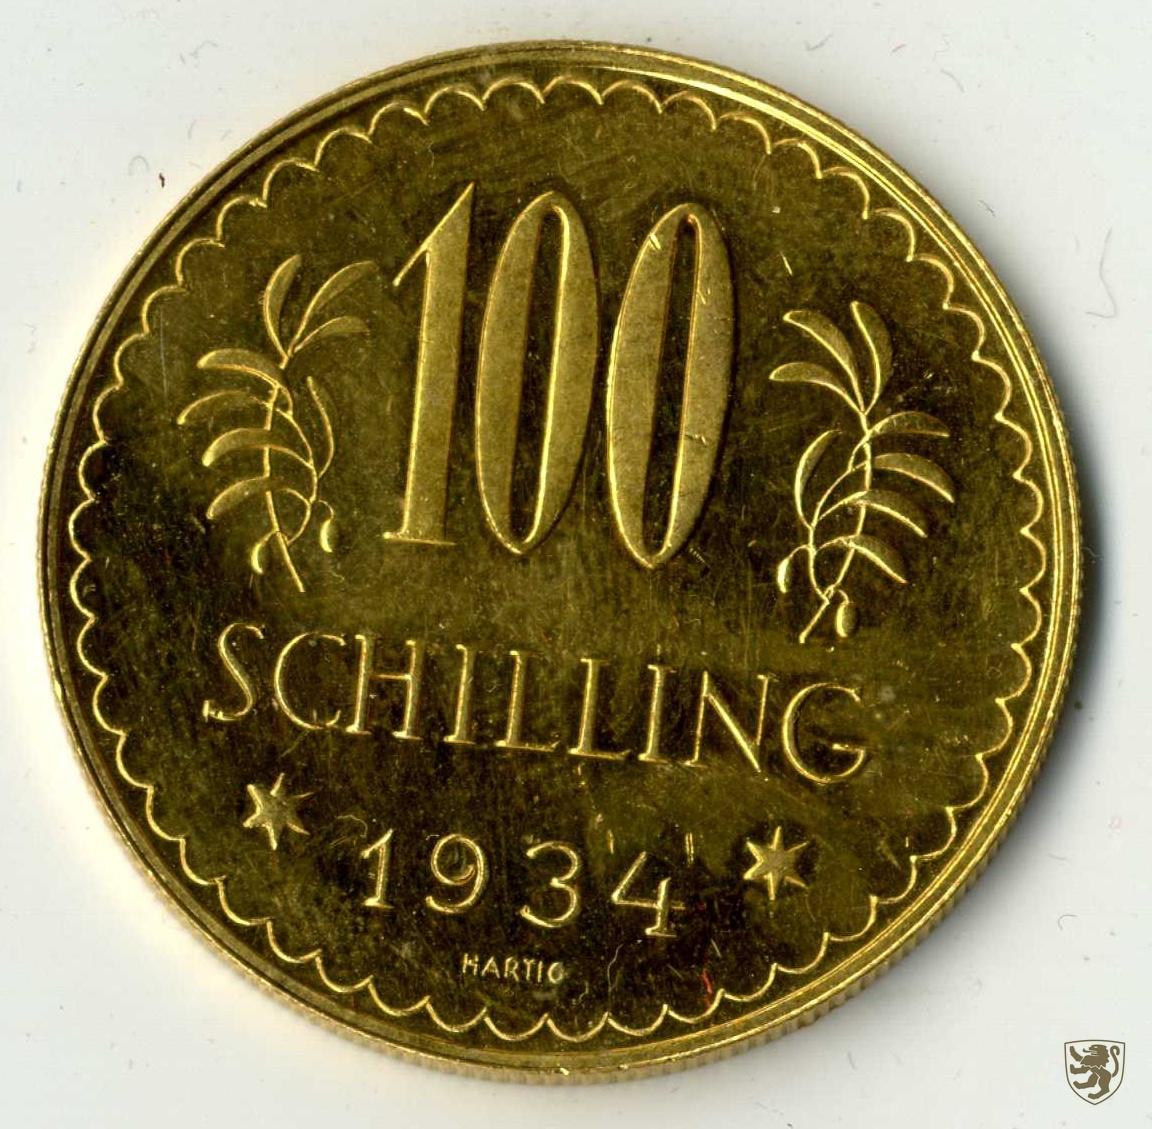 sterreich republik 100 schilling 1934 wien fr 520 ebay. Black Bedroom Furniture Sets. Home Design Ideas